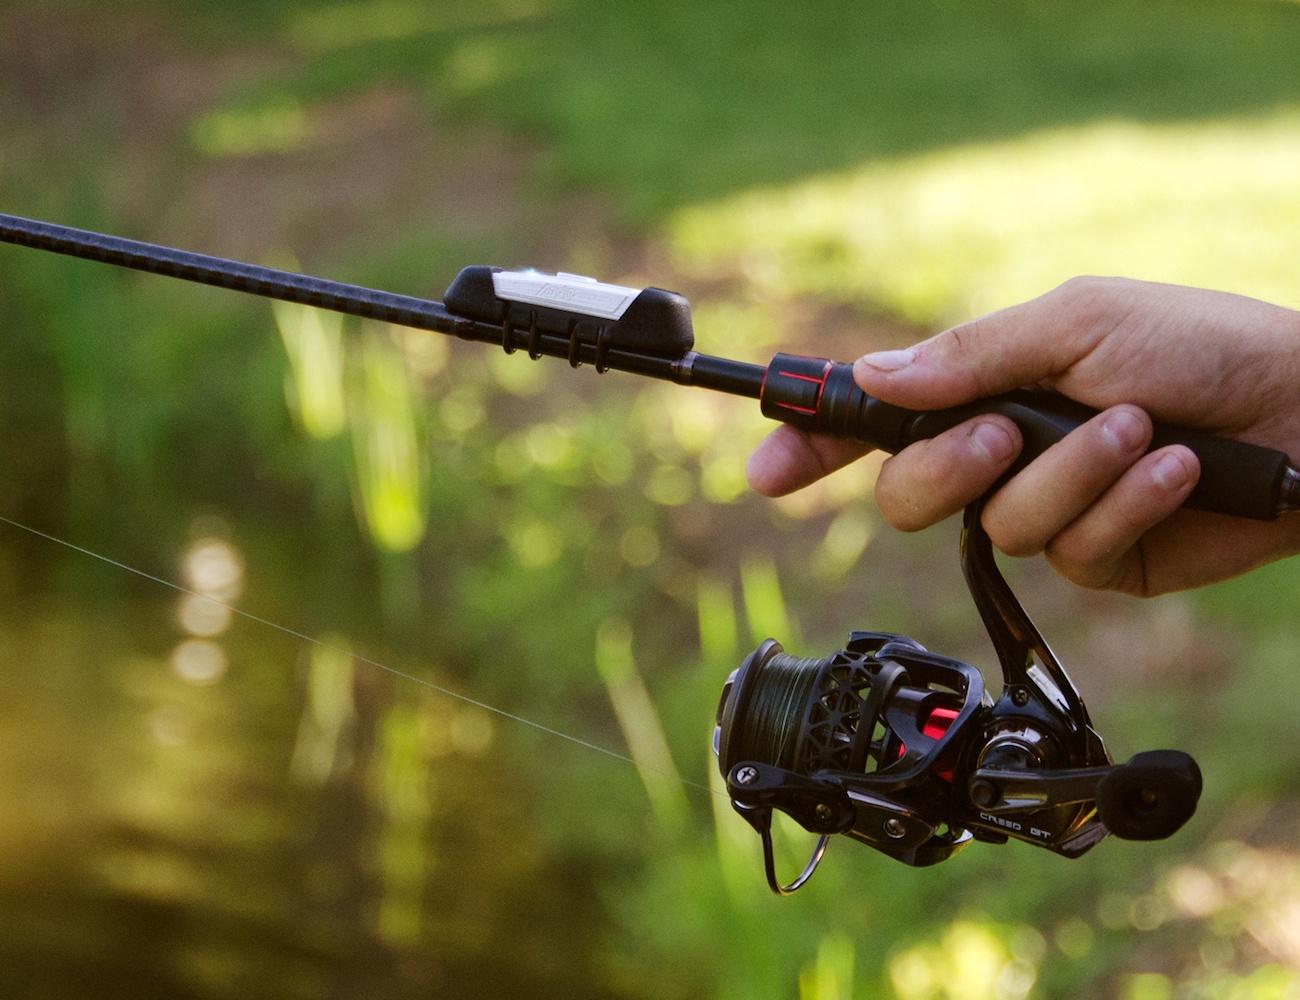 ANGLR Tracker Rod-Mounted Fishing Tracker